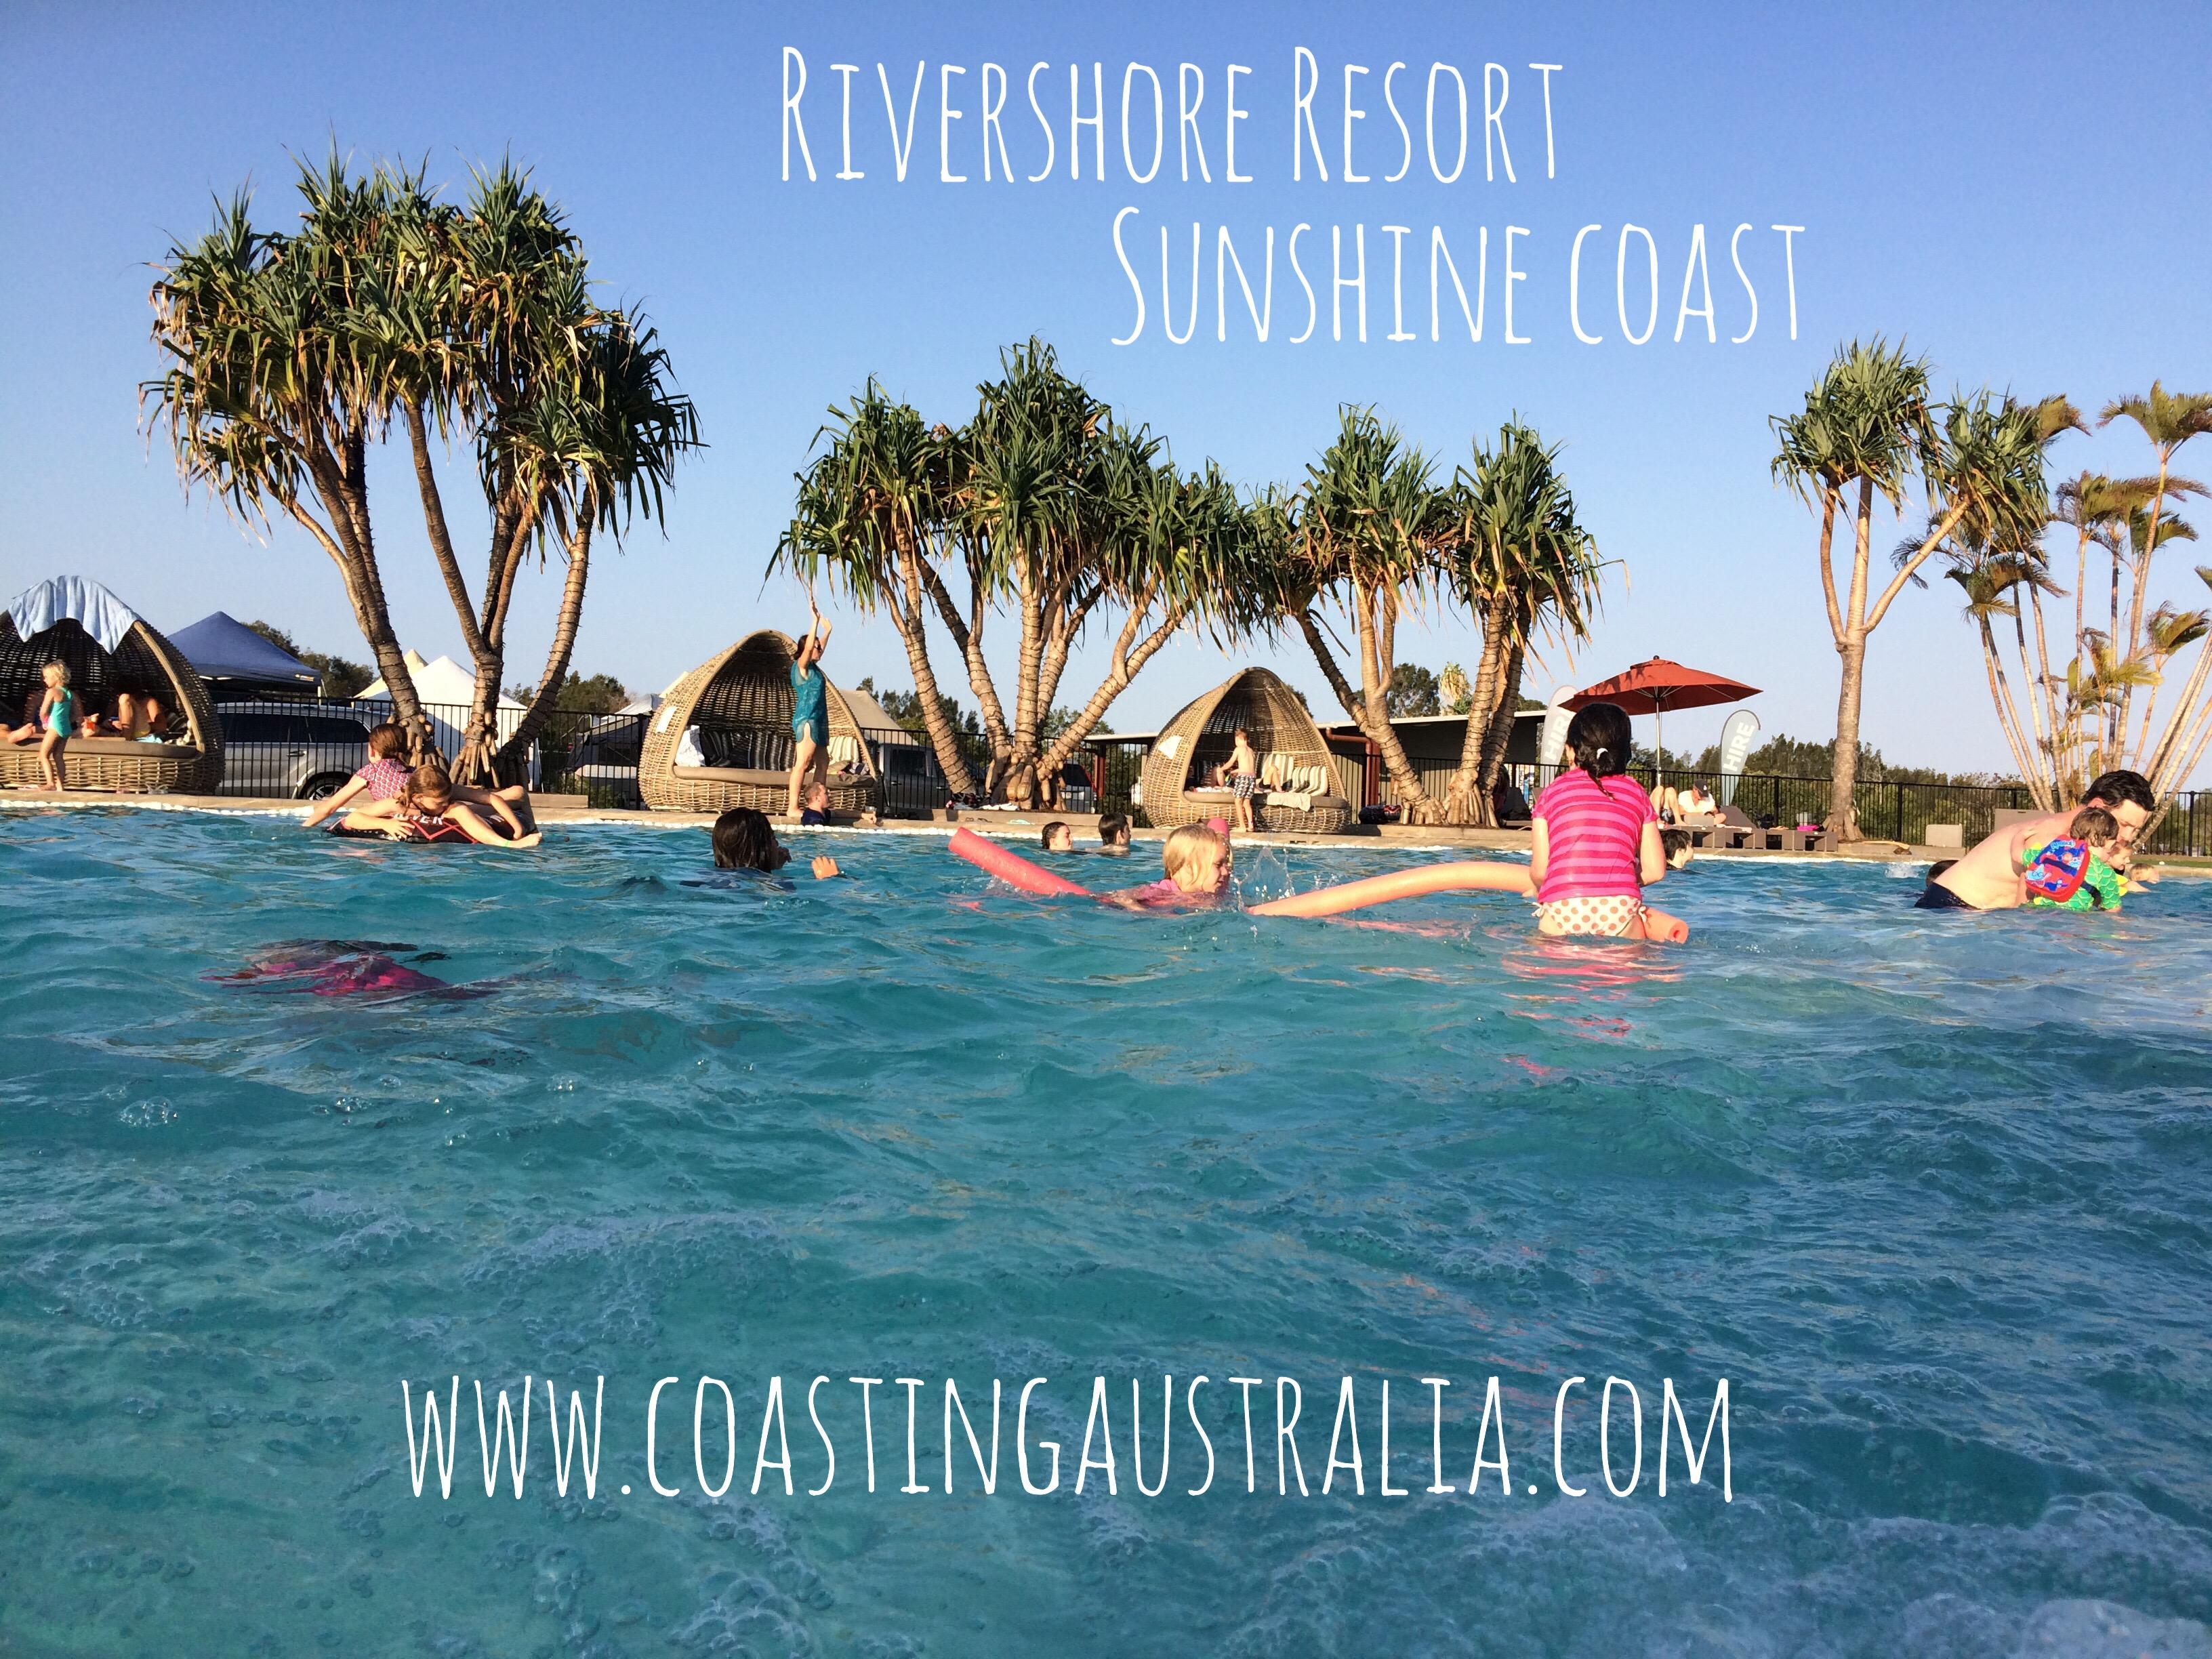 Big 4 Rivershore Resort – Sunshine Coast